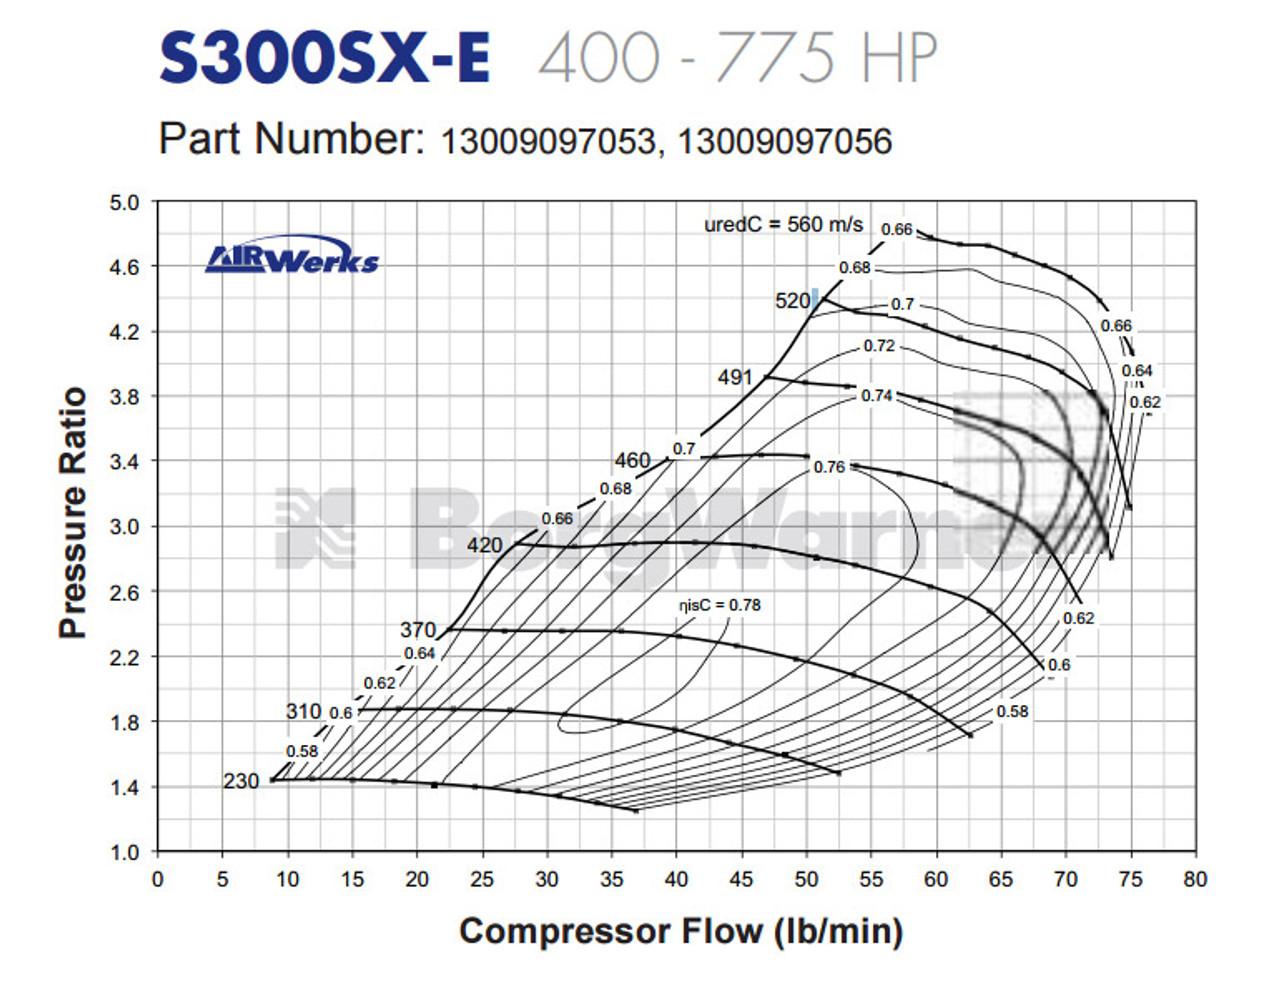 Borg Warner S362 SX-E 8376 62/68 13009097056